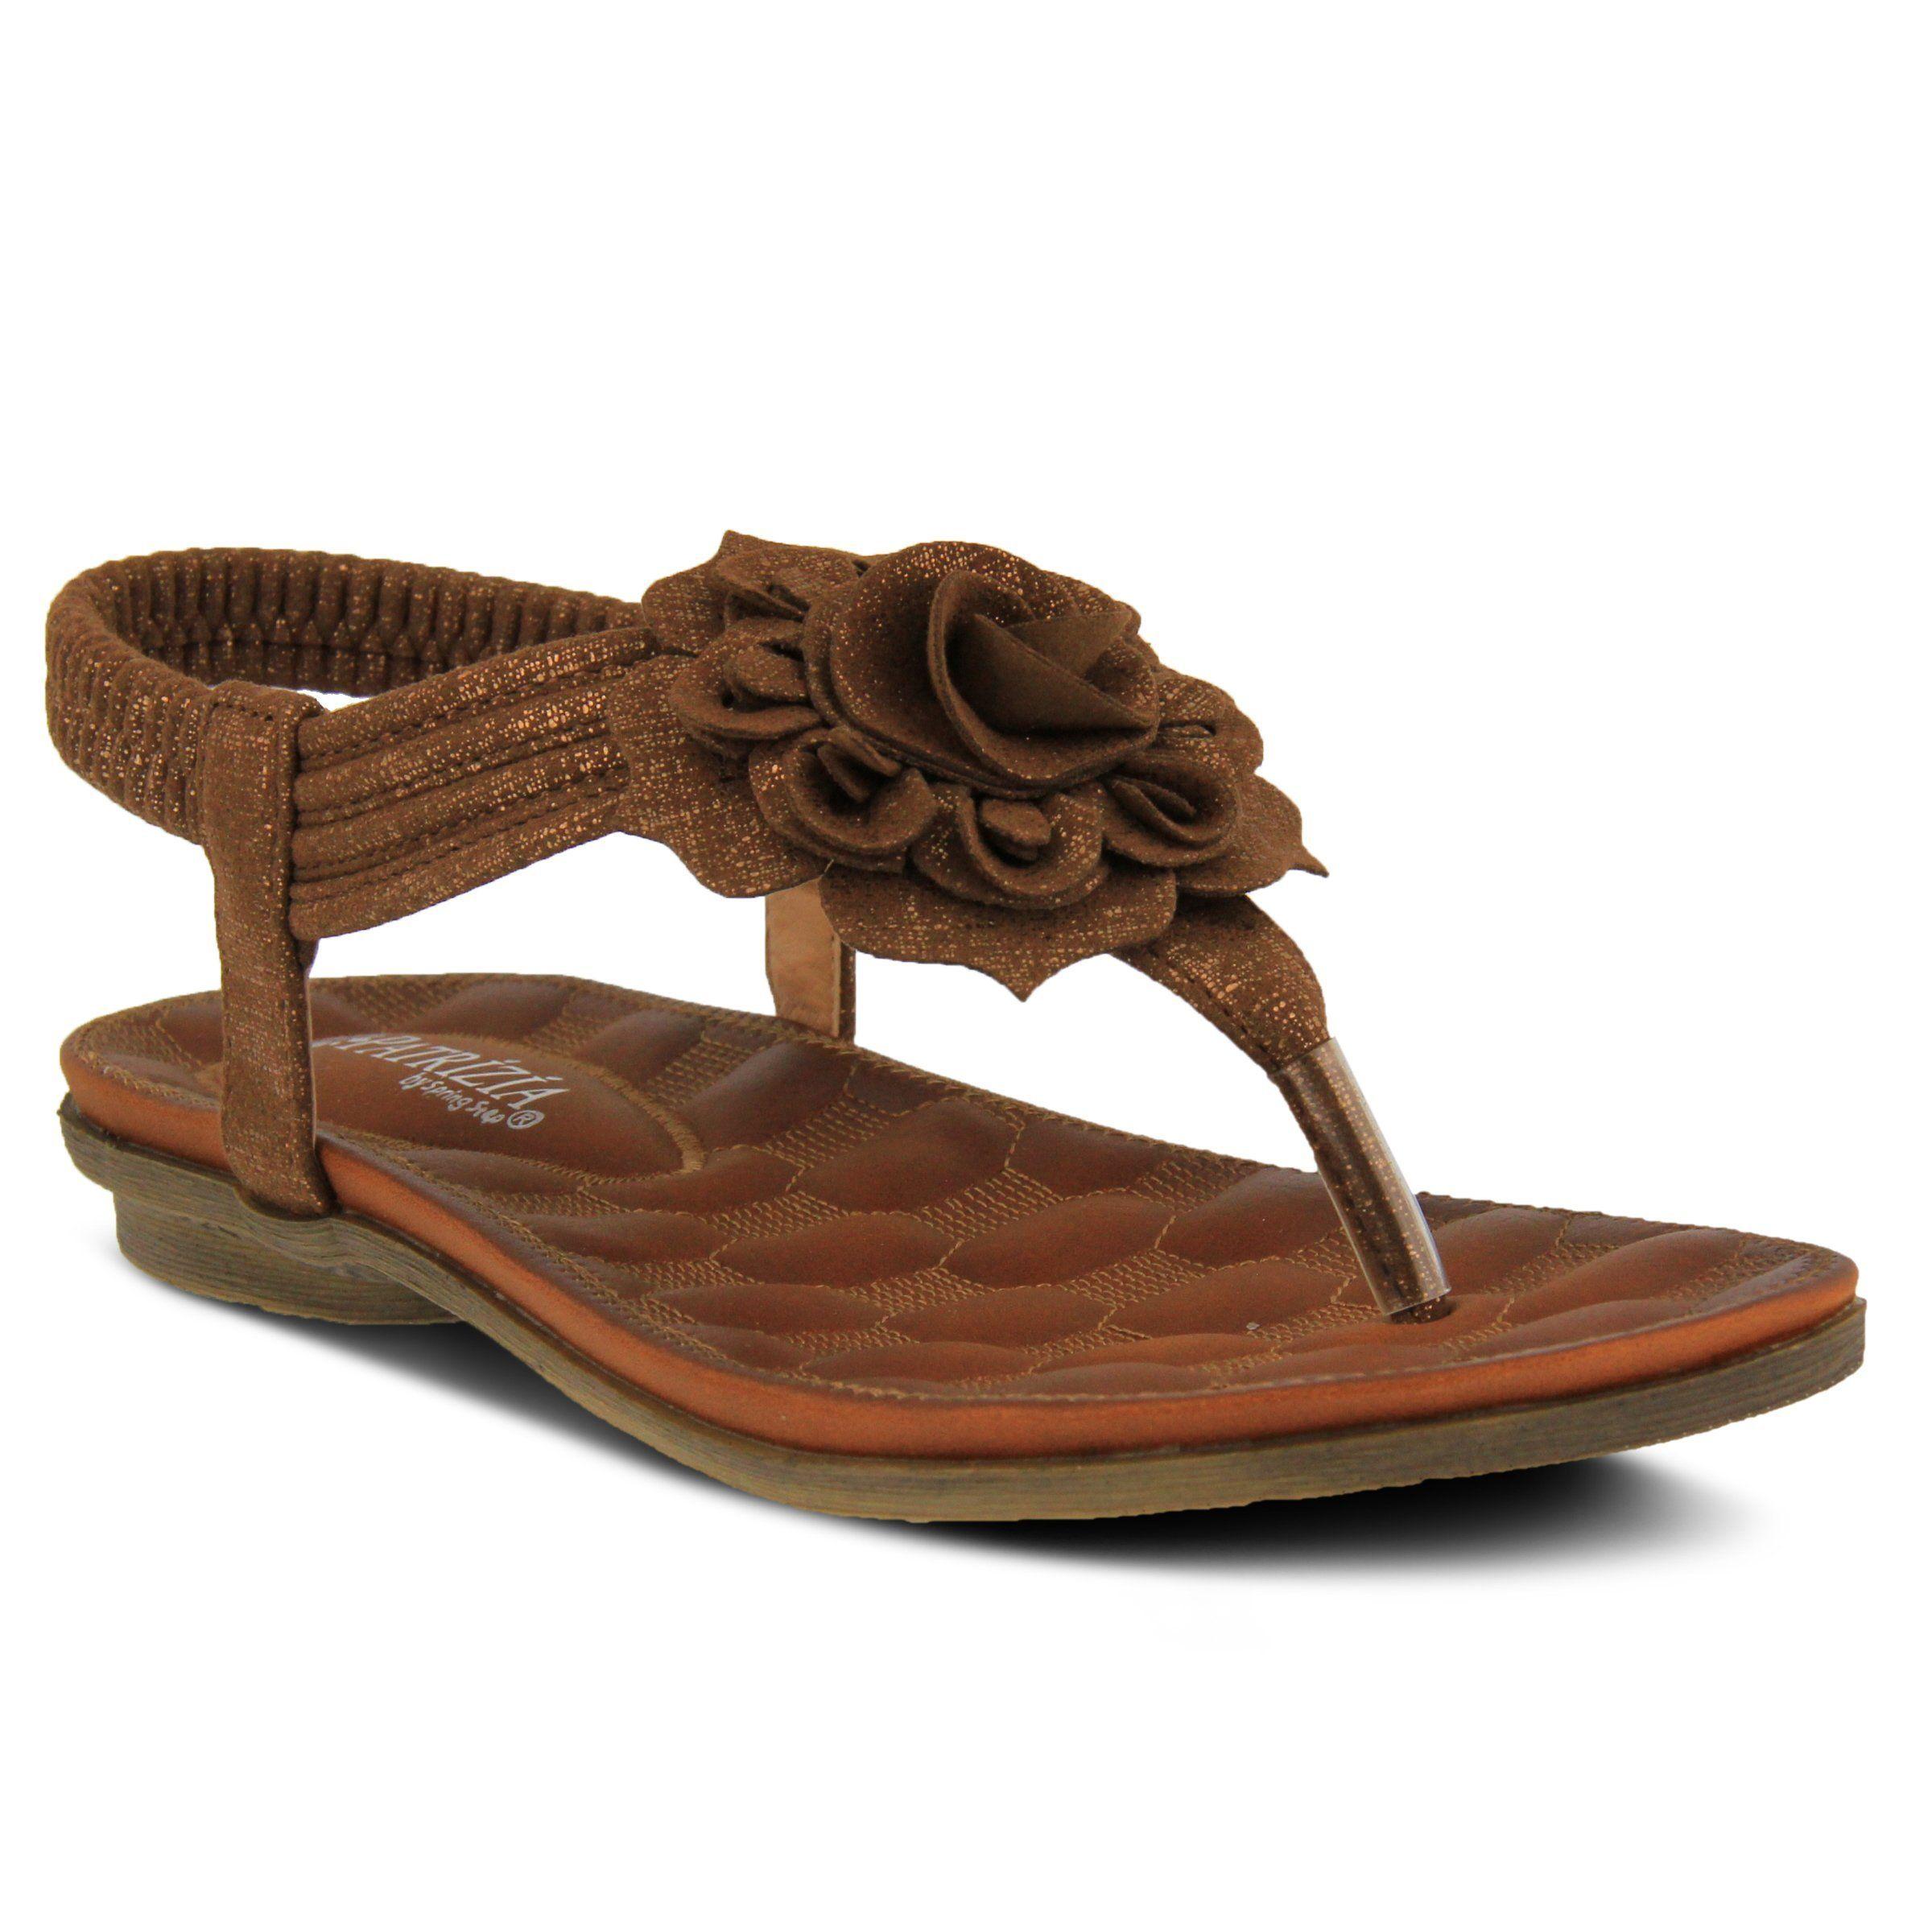 Patrizia by Spring Step CABERNET Womens Camel Comfort Sandals